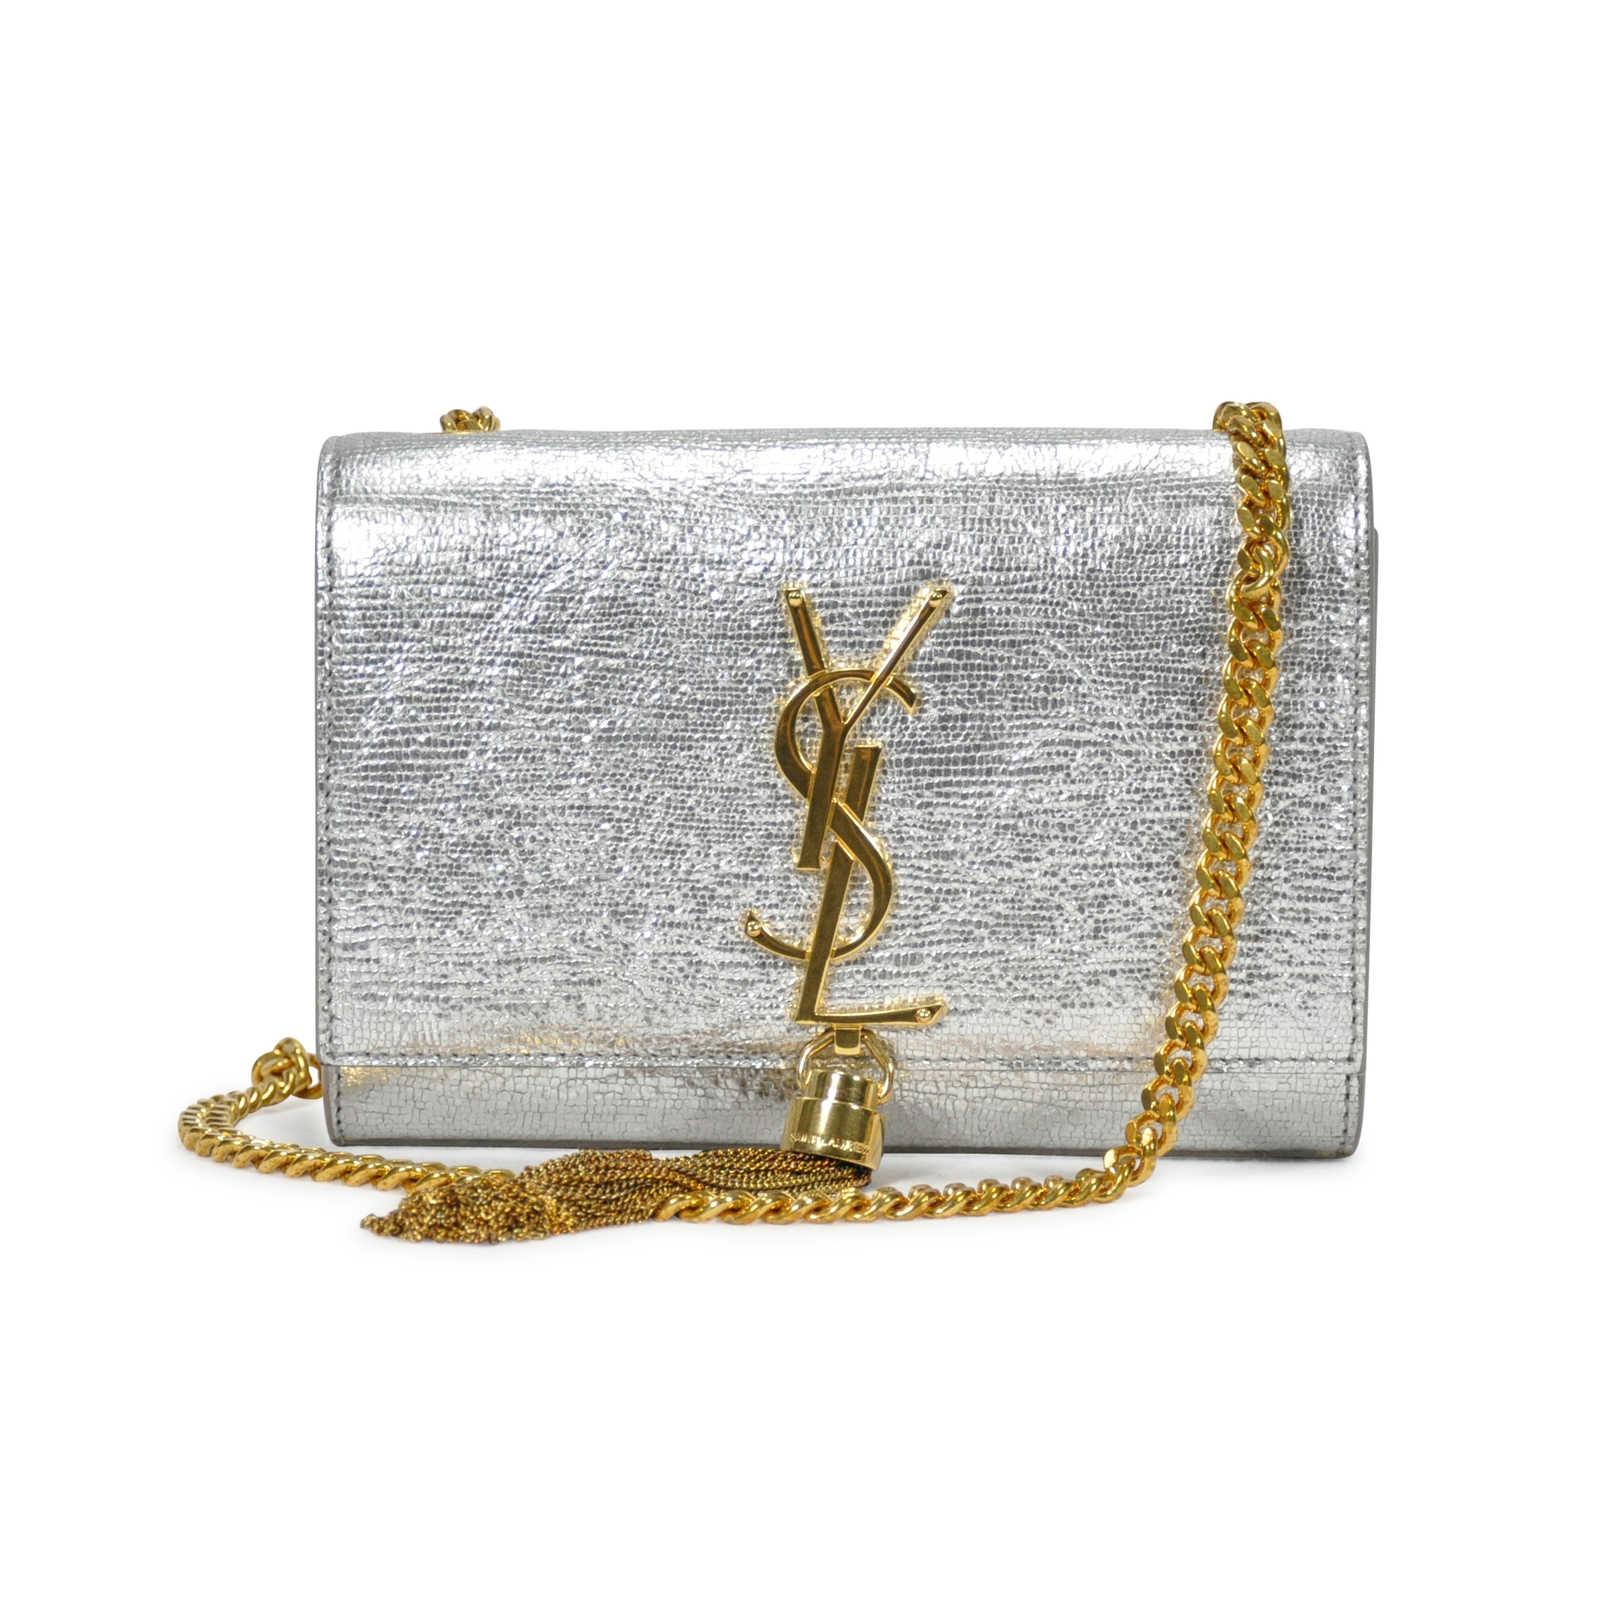 68cdbb40dad Small Cassandre Leather Shoulder Bag Saint Laurent